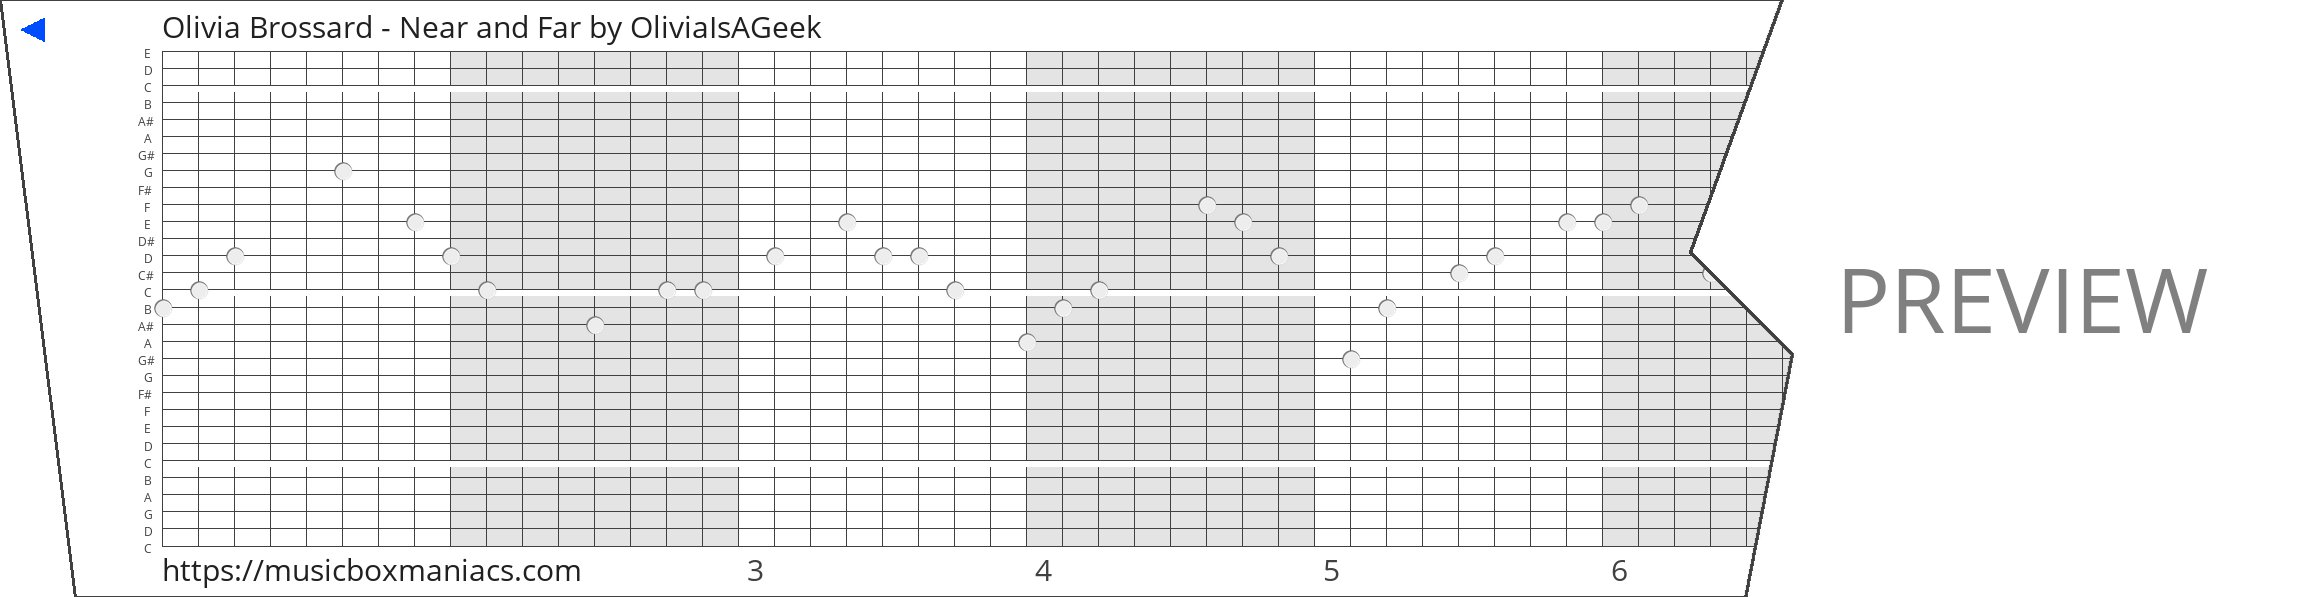 Olivia Brossard - Near and Far 30 note music box paper strip